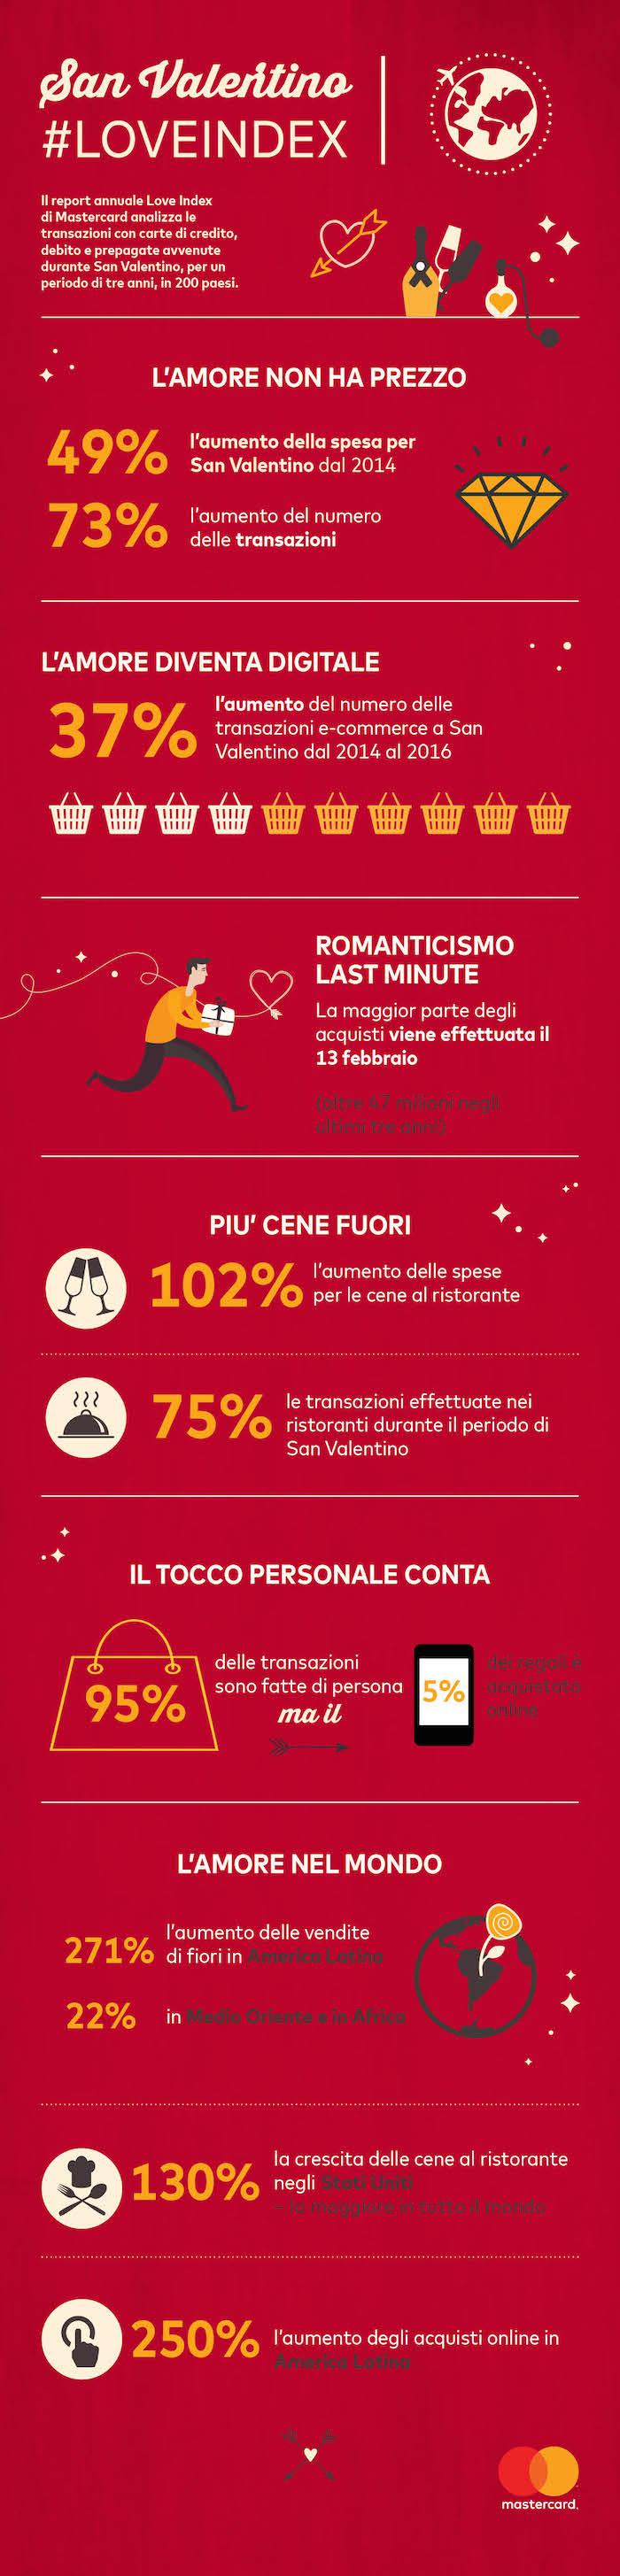 Infografica_Mastercard_Love Index